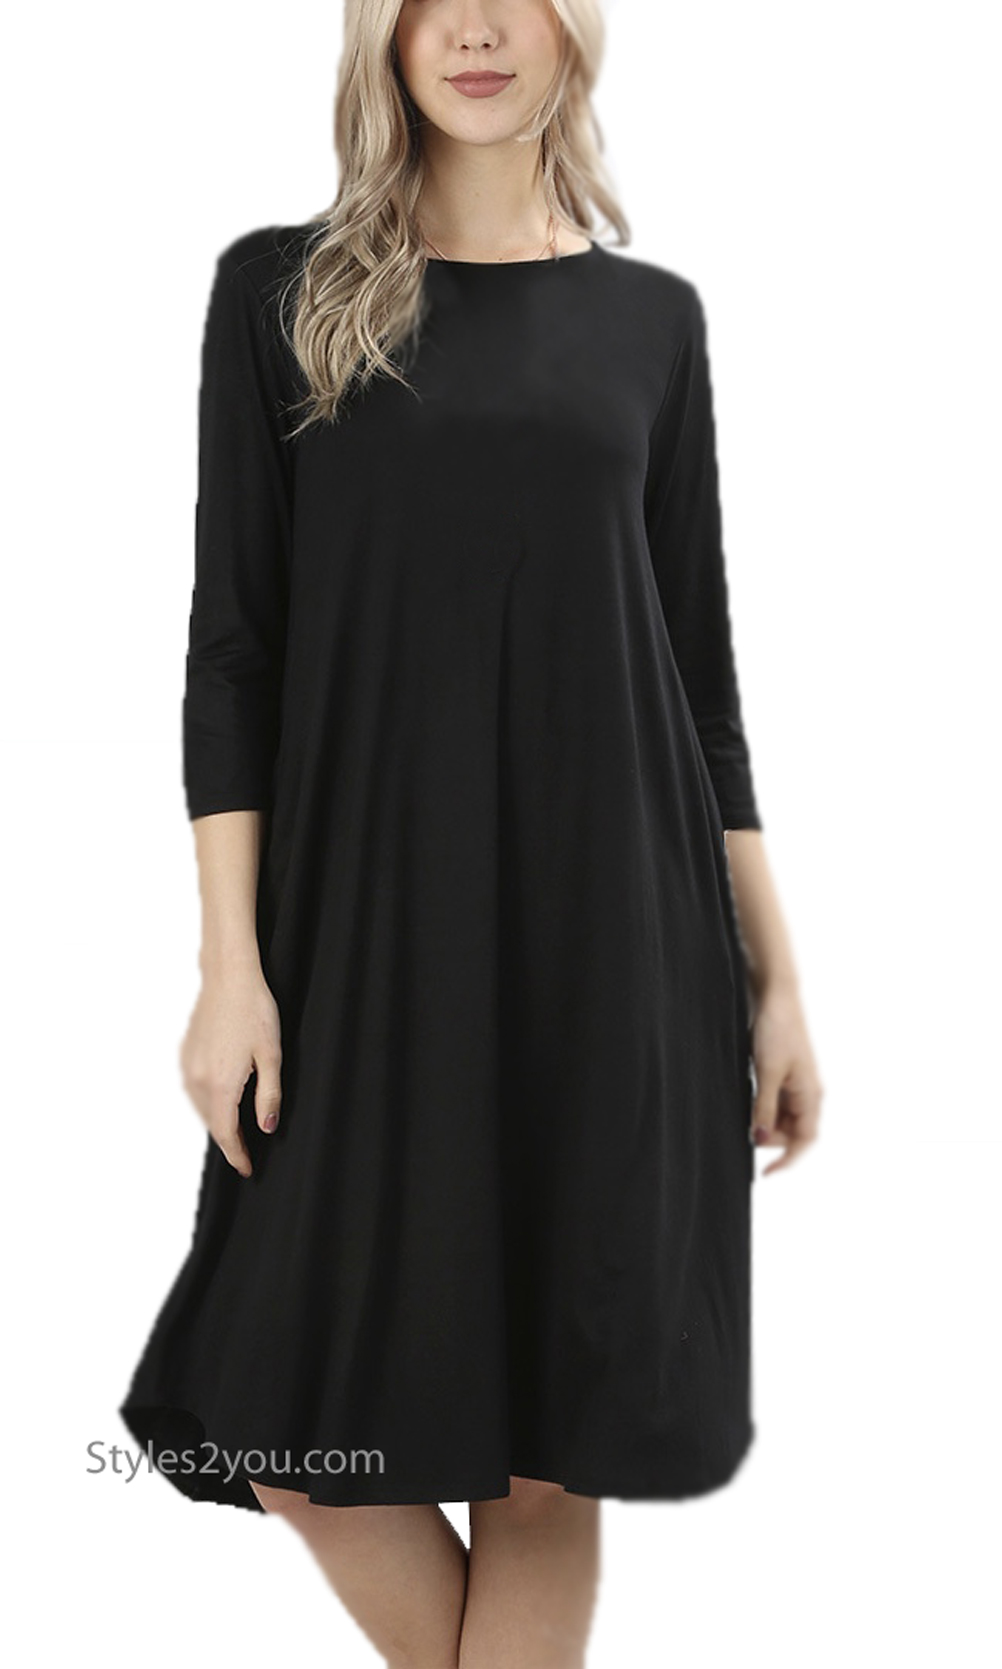 Madison PLUS SIZE 3/4 Sleeve Round Neck With Pockets Dress Black